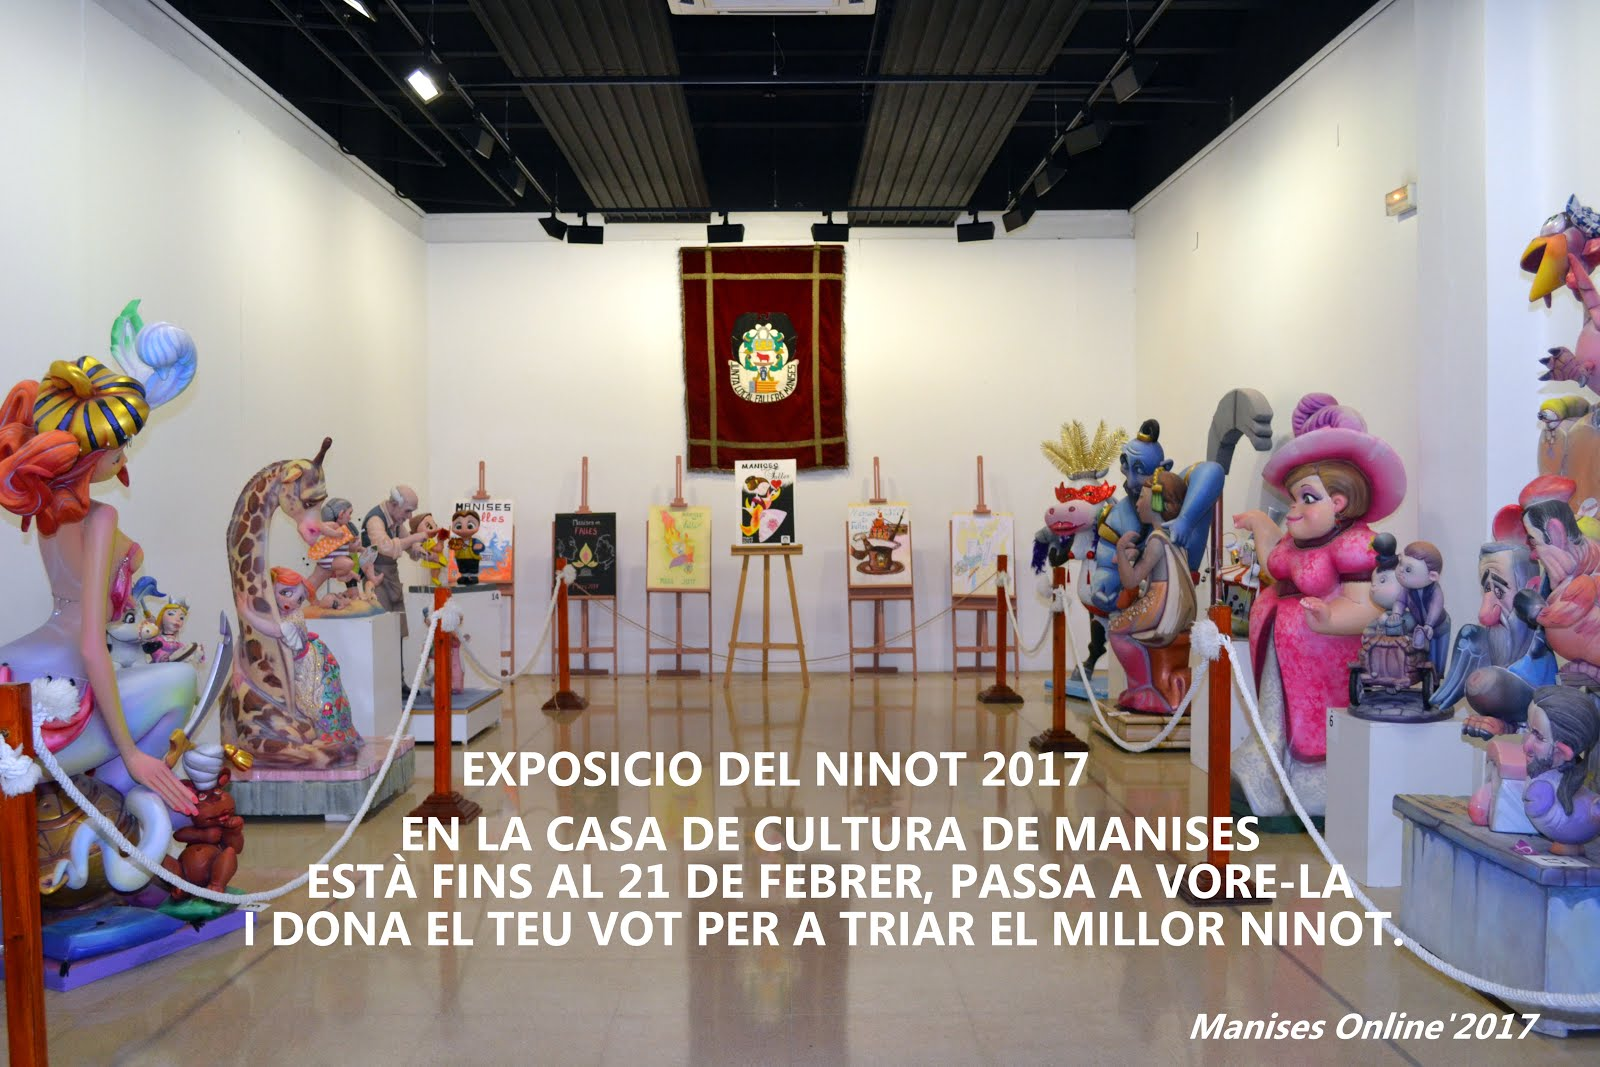 14.02.17 FALLES DE 2017, EXPOSICIO DEL NINOT EN LA CASA DE CULTURA